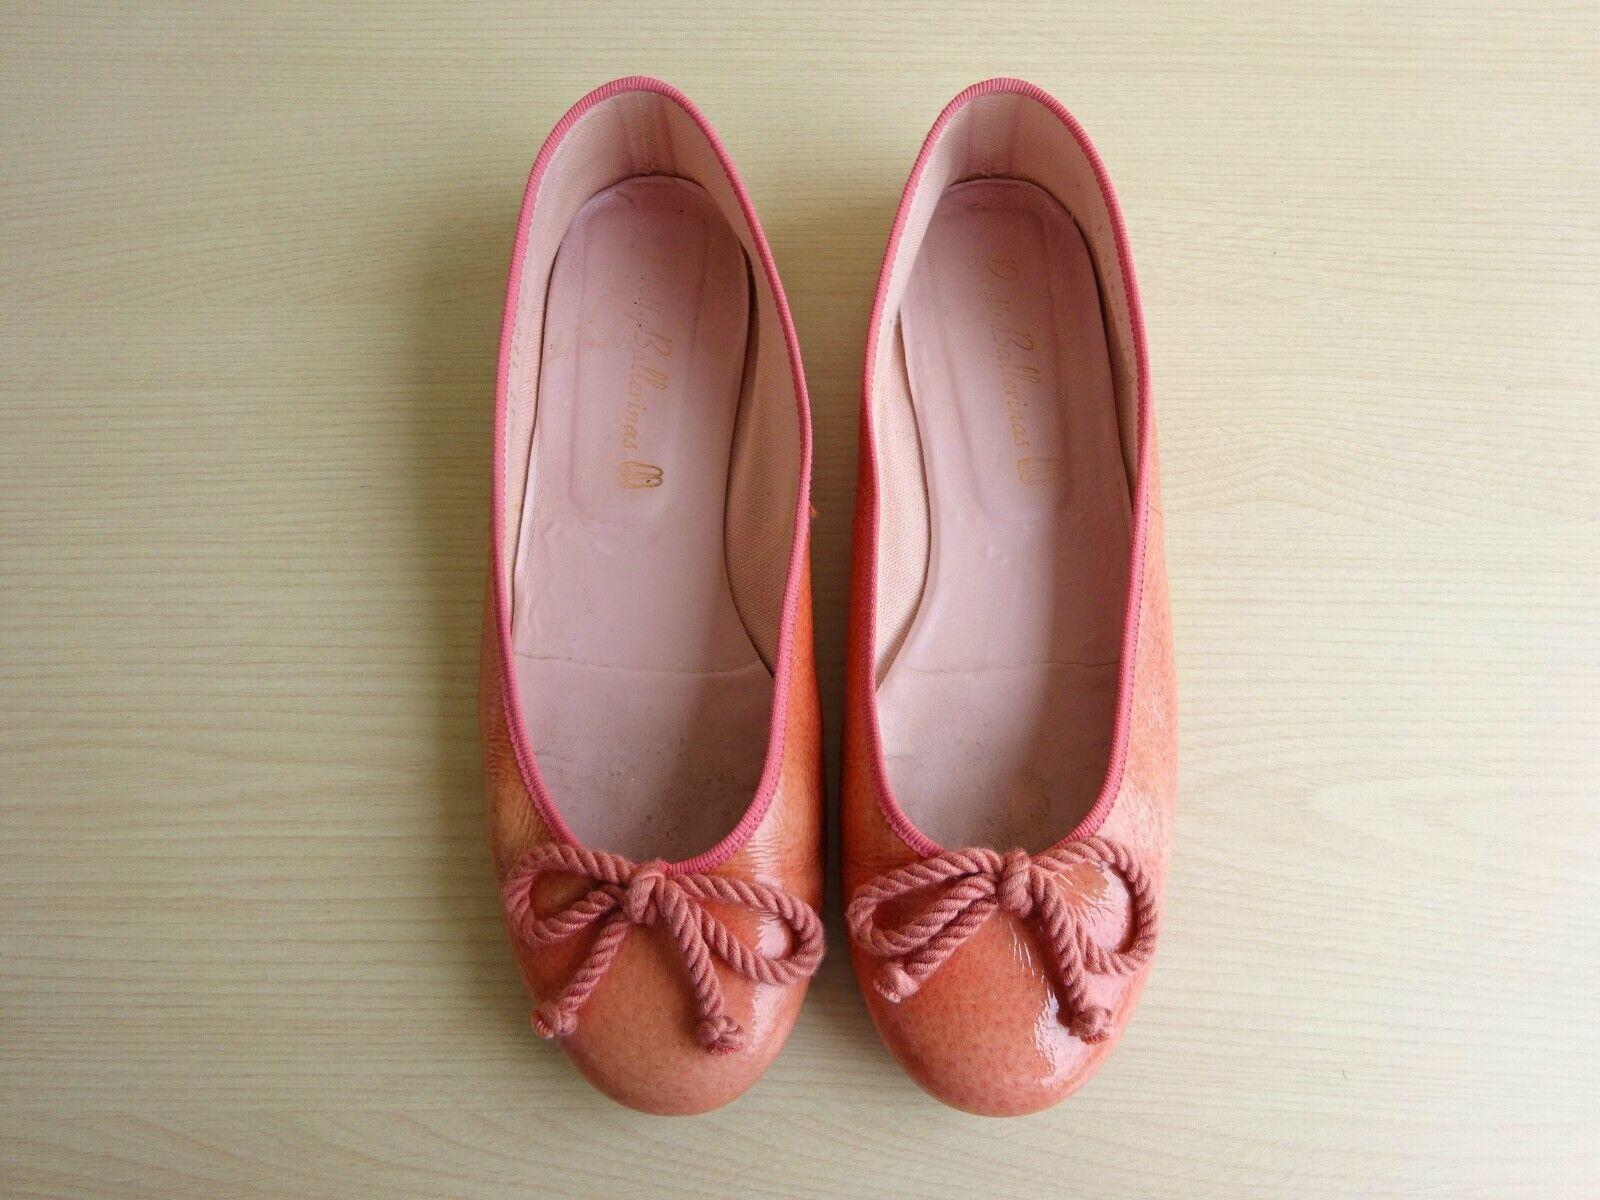 Original Pretty Ballerinas Flache Ballerinas Gr. 38 Top-Zustand